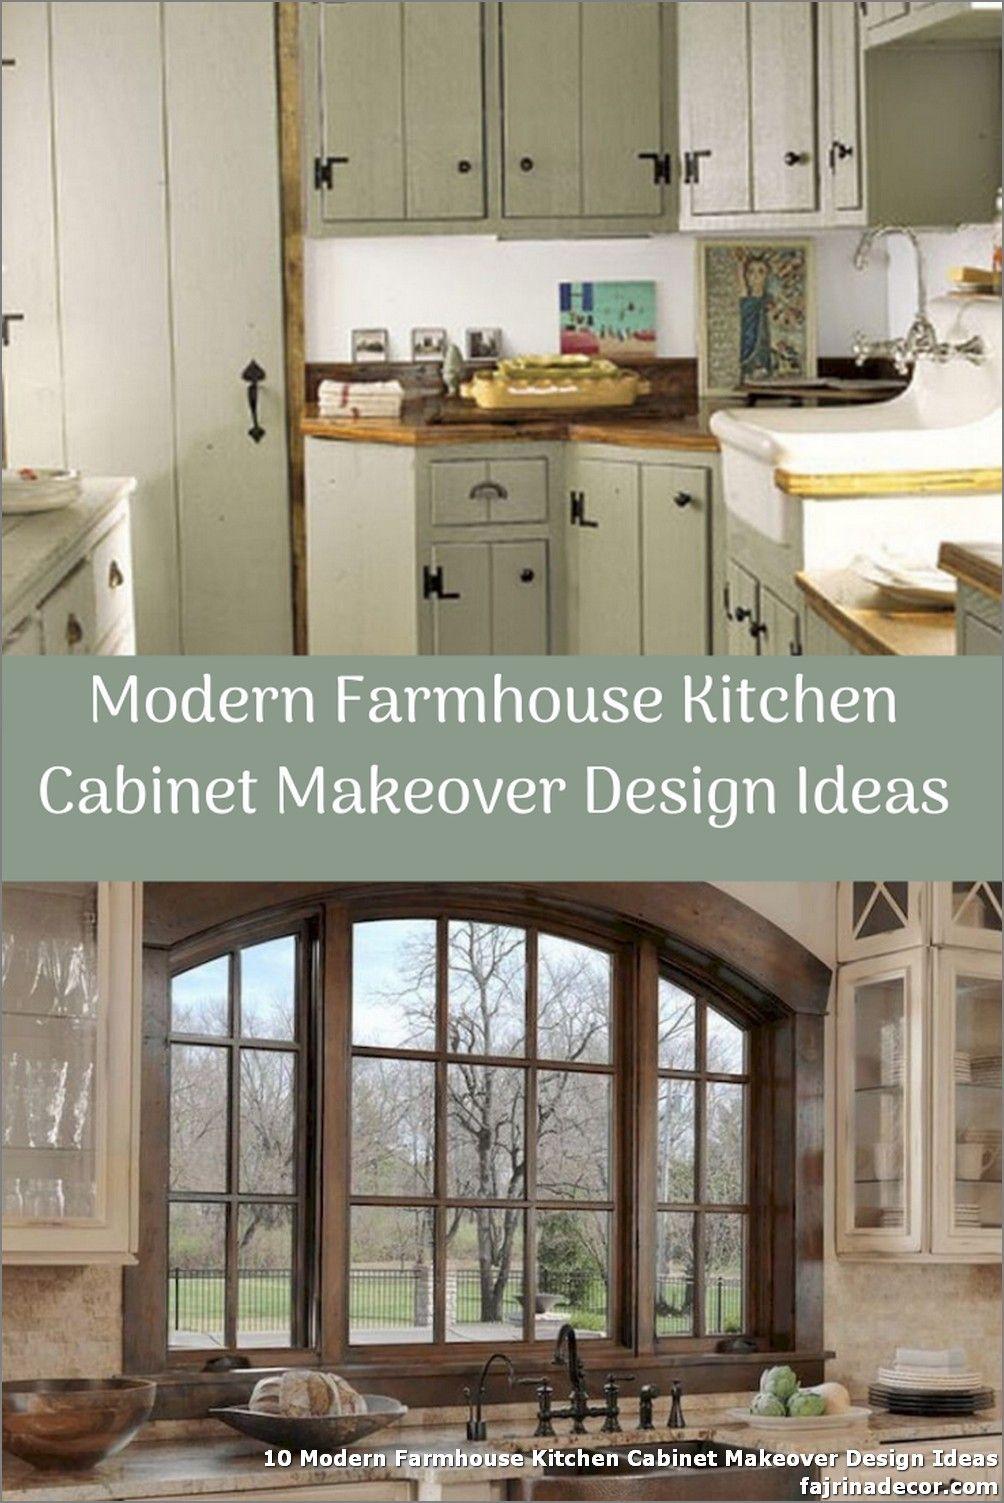 10 Modern Farmhouse Kitchen Cabinet Makeover Design Ideas In 2020 Farmhouse Kitchen Cabinets Modern Farmhouse Kitchens Kitchen Cabinets Makeover